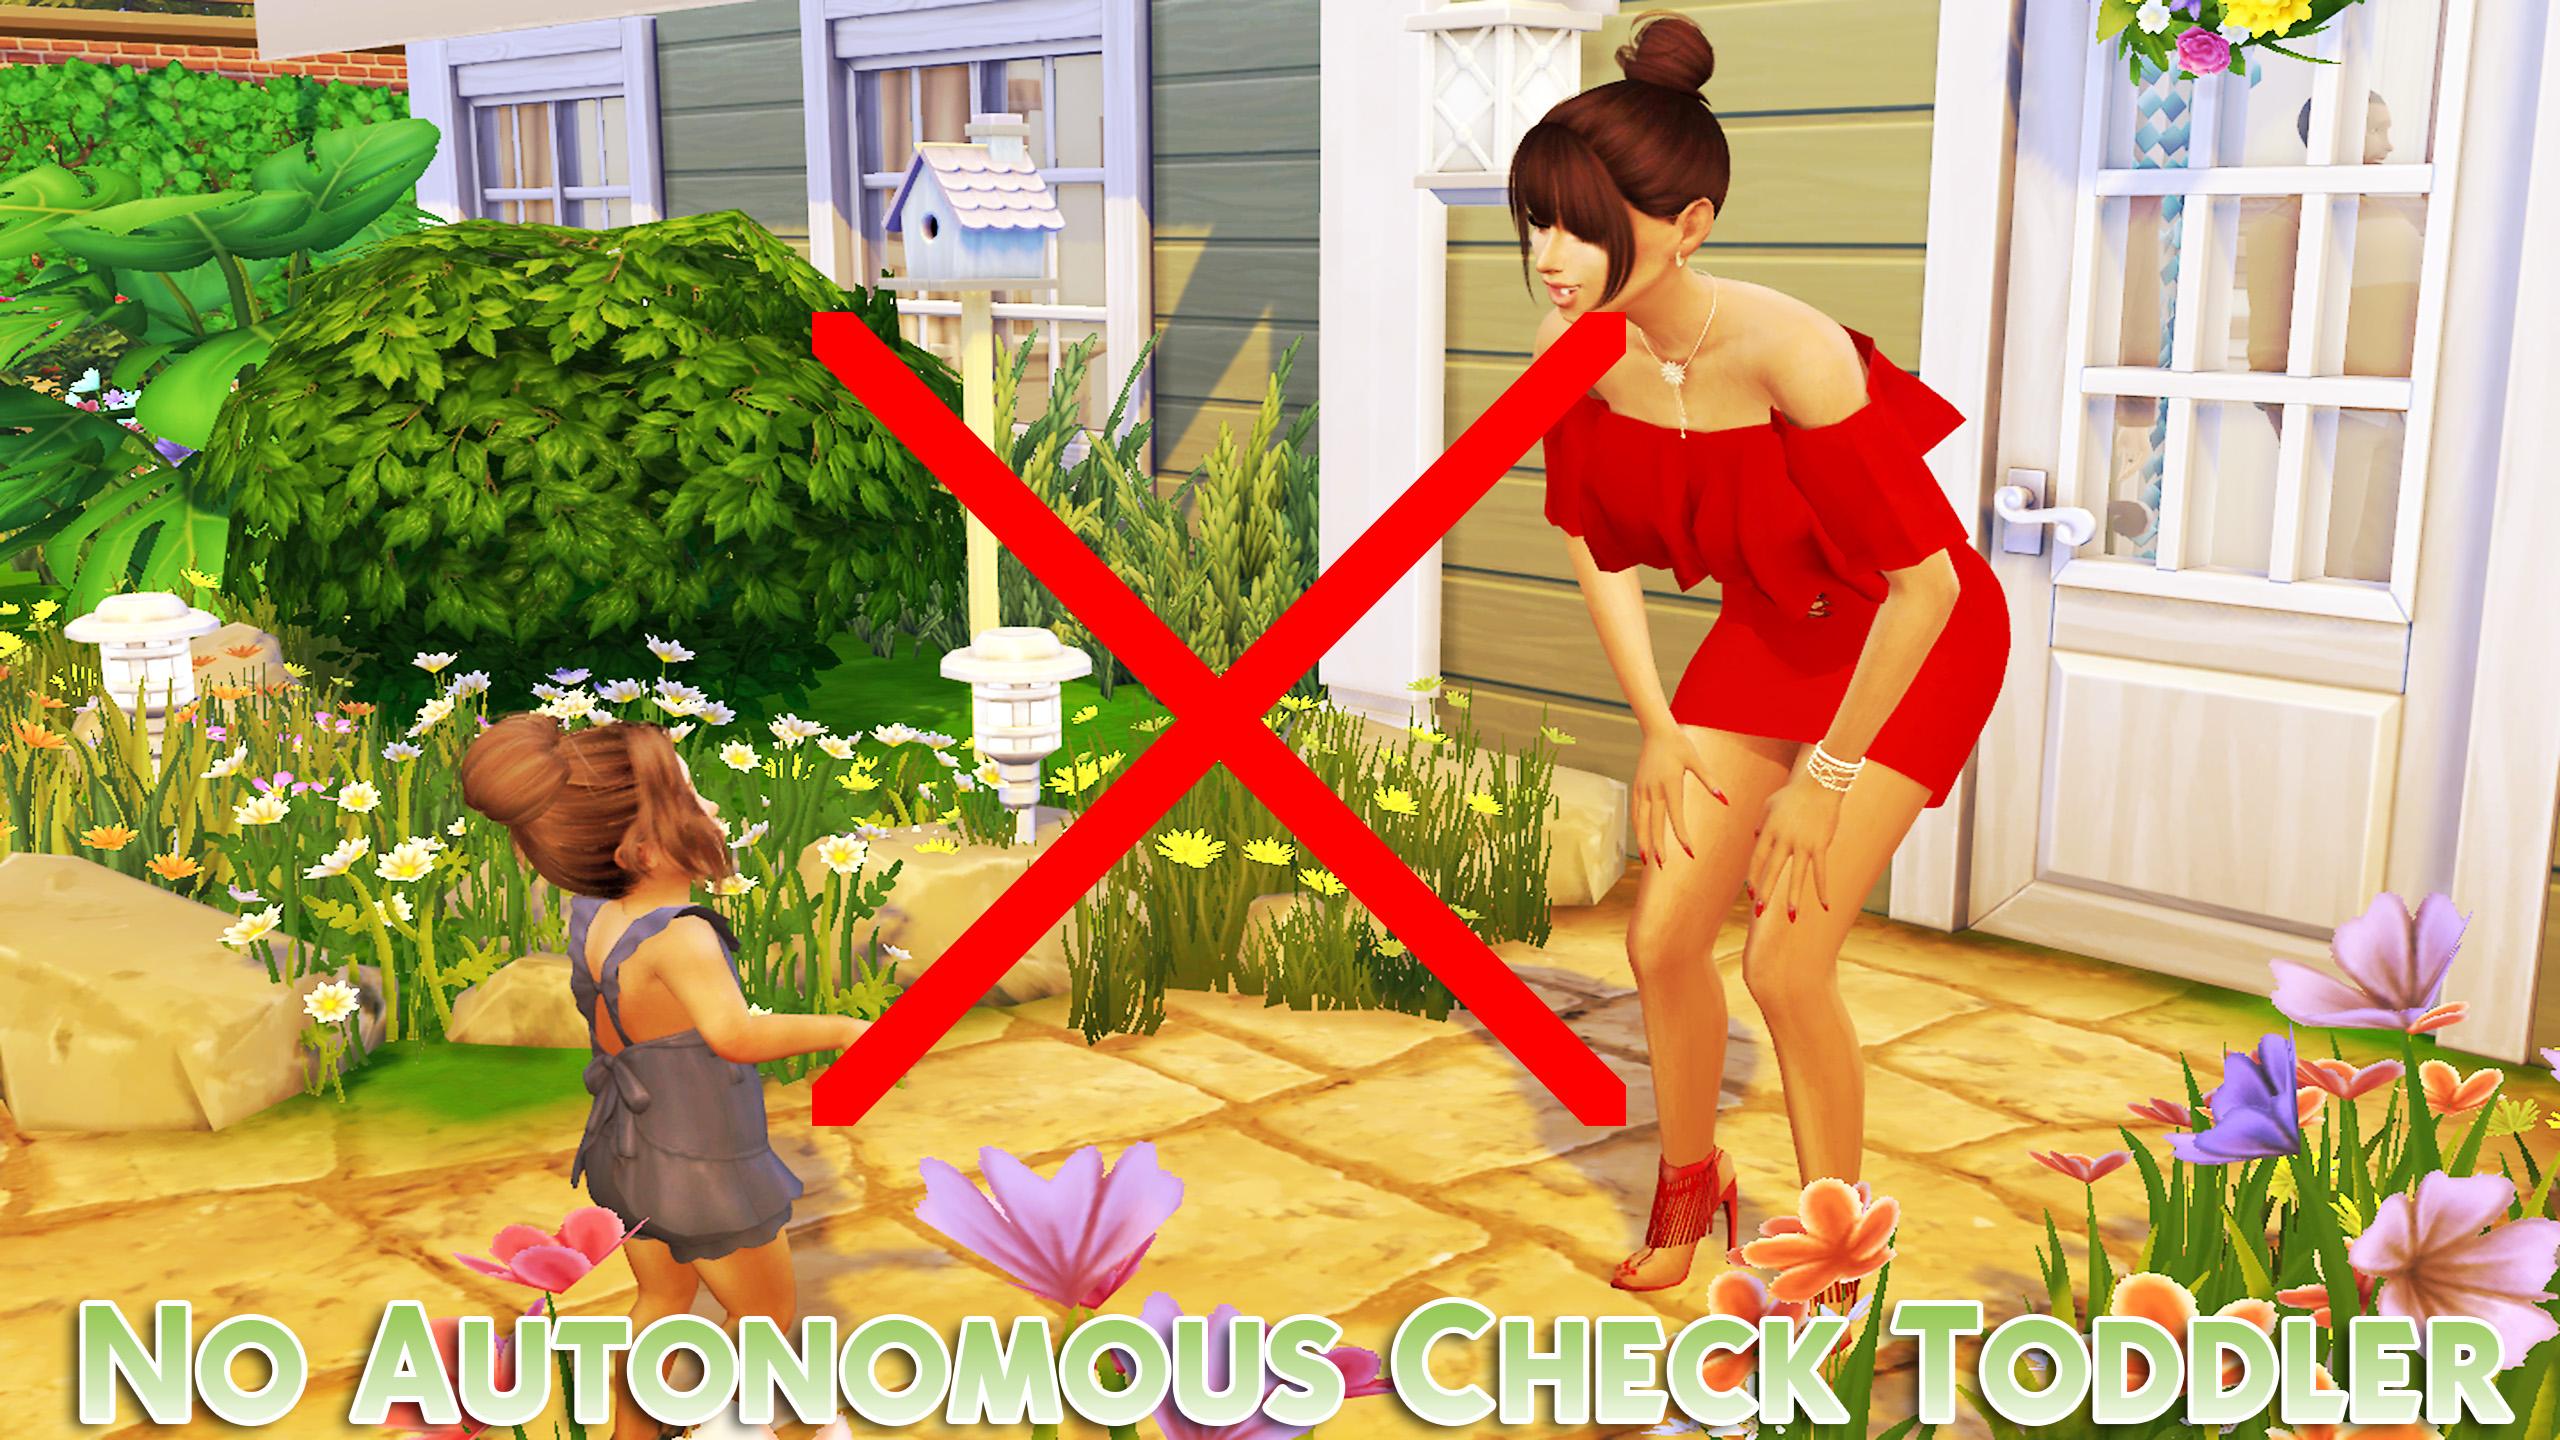 ModTheSims - No Autonomous Check Toddler